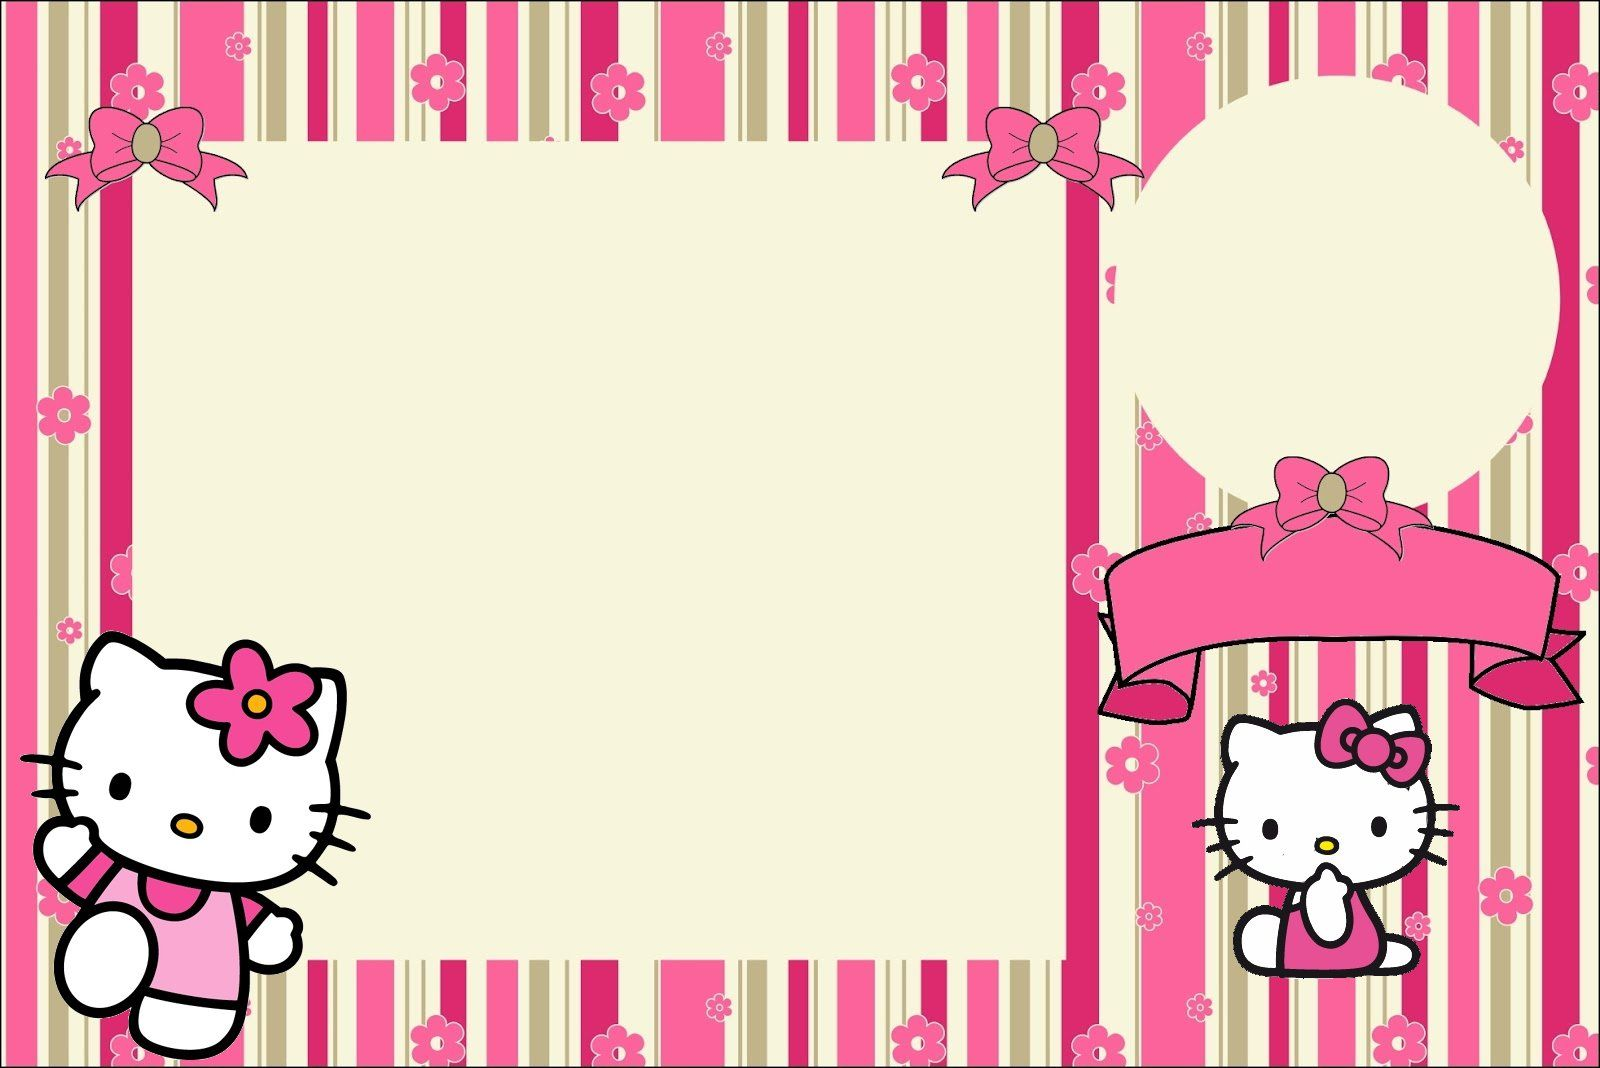 1Convite10jpg 1600 1068 hello kitty Pinterest – Free Printable Hello Kitty Birthday Card